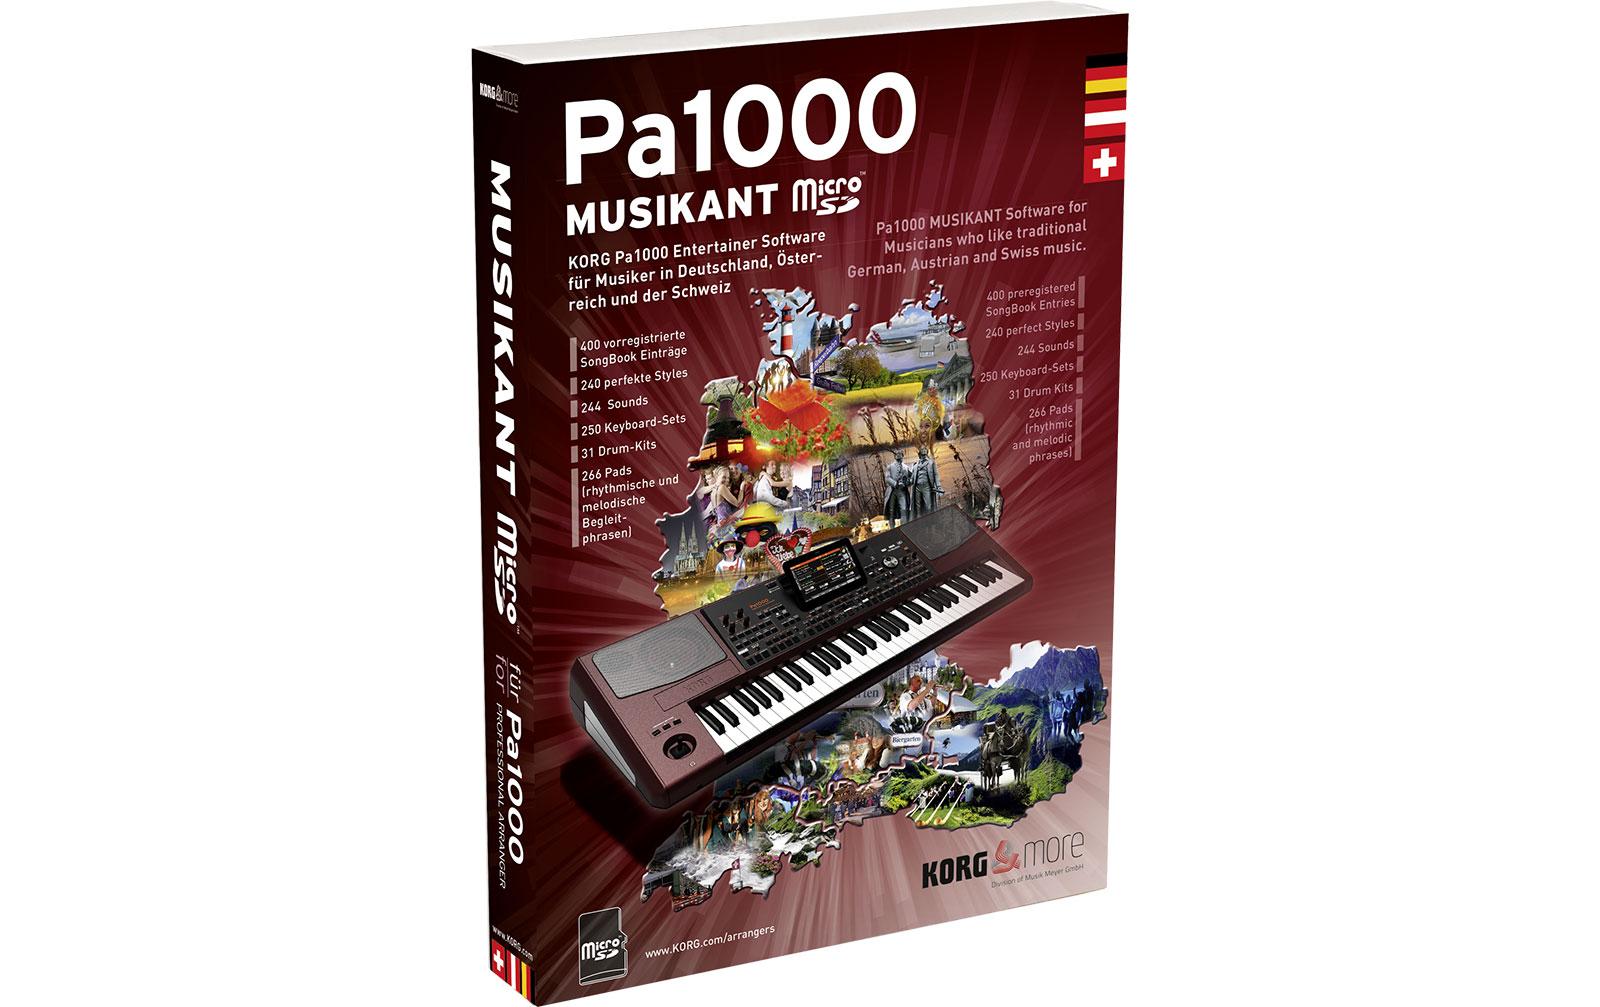 korg-musikant-fa-r-pa1000-software-mit-micro-sd-karte